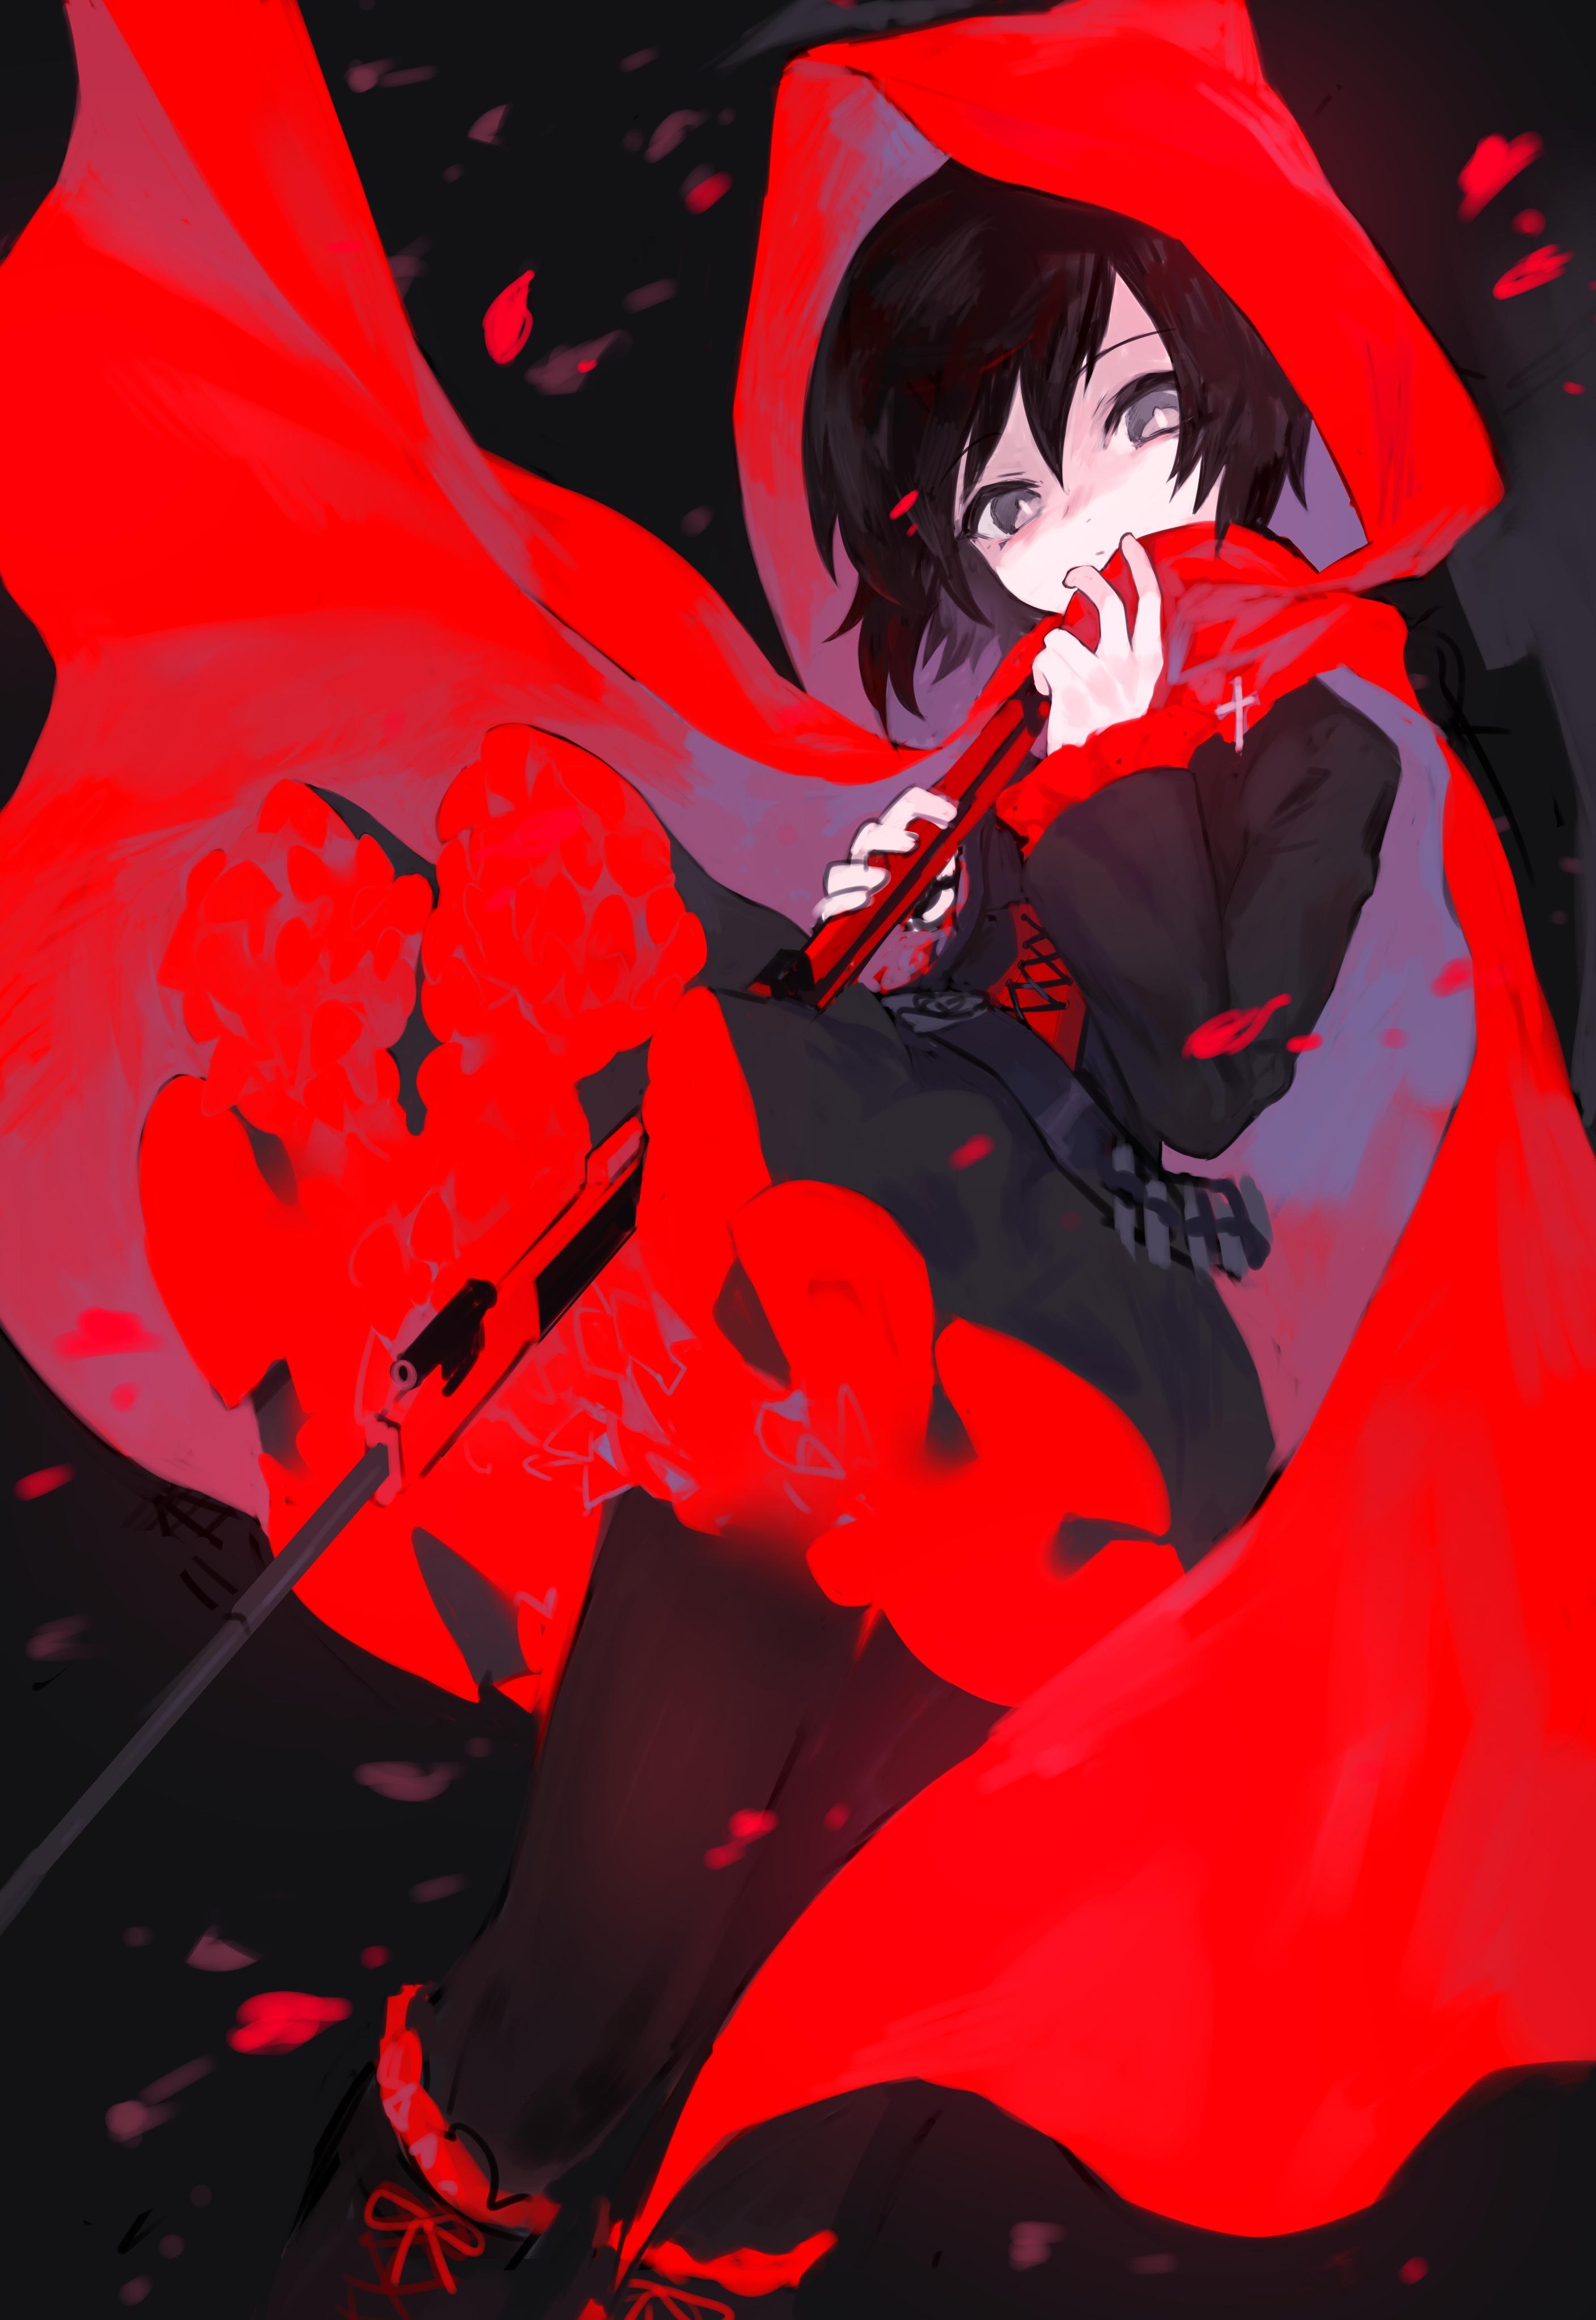 Rwby Monty Oum Zerochan Anime Image Board